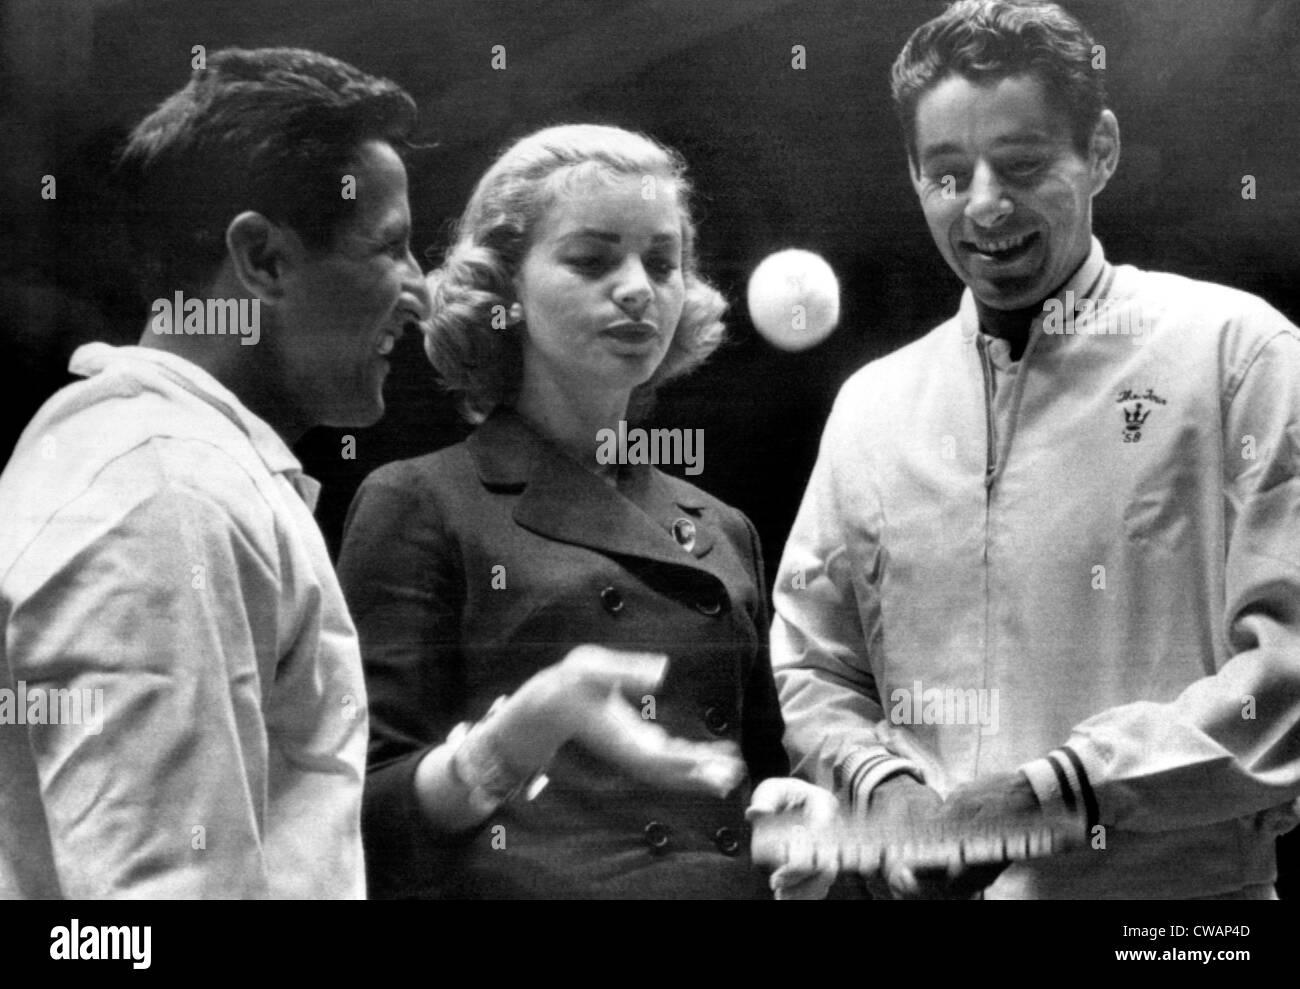 Actress Lauren Bacall serves up ball to pro tennis king Pancho